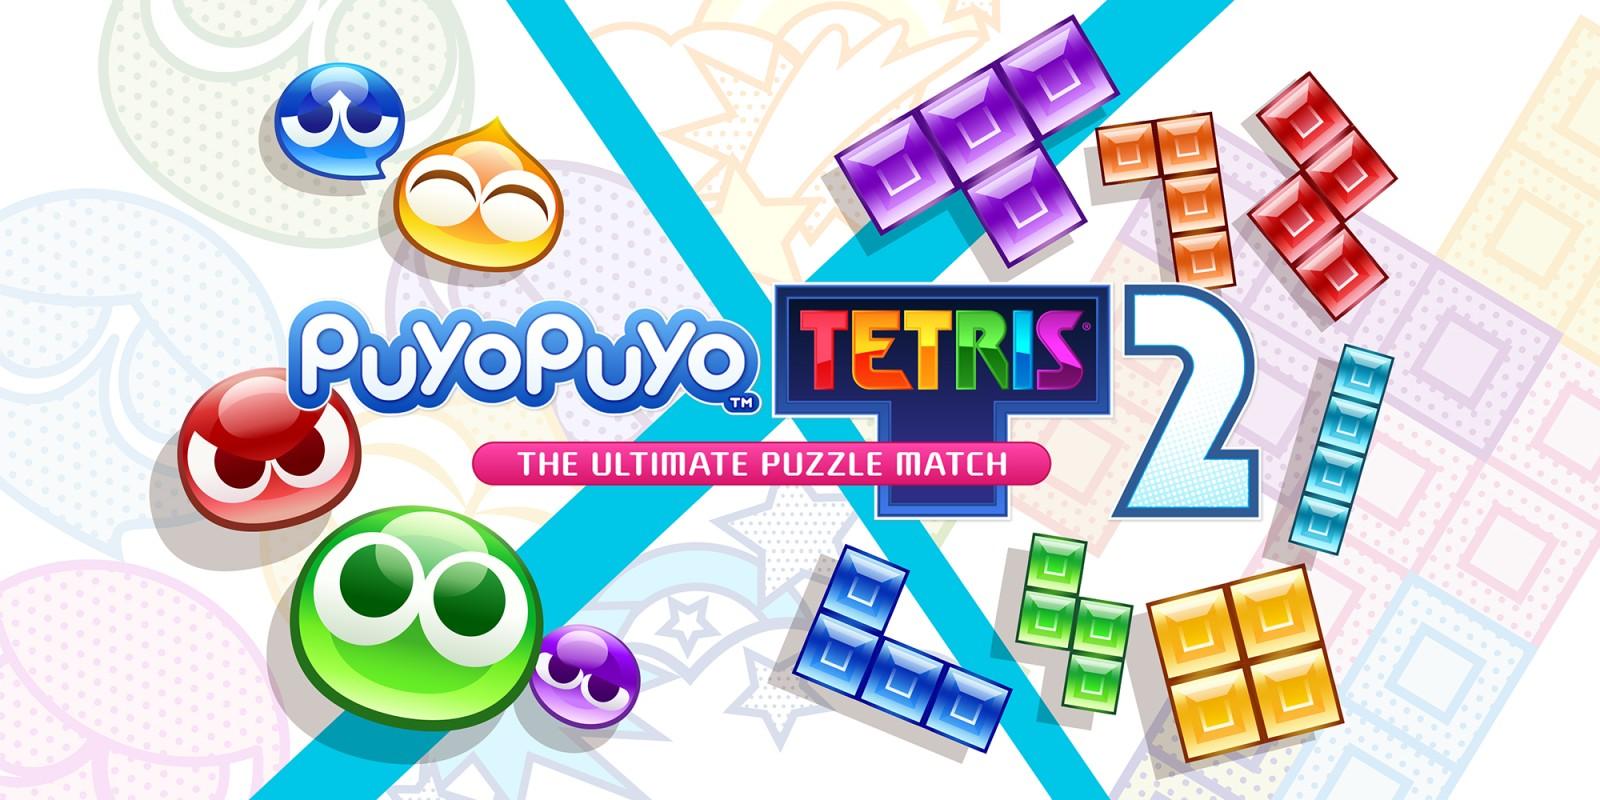 Puyo Puyo Tetris 2 | Nintendo Switch | Juegos | Nintendo